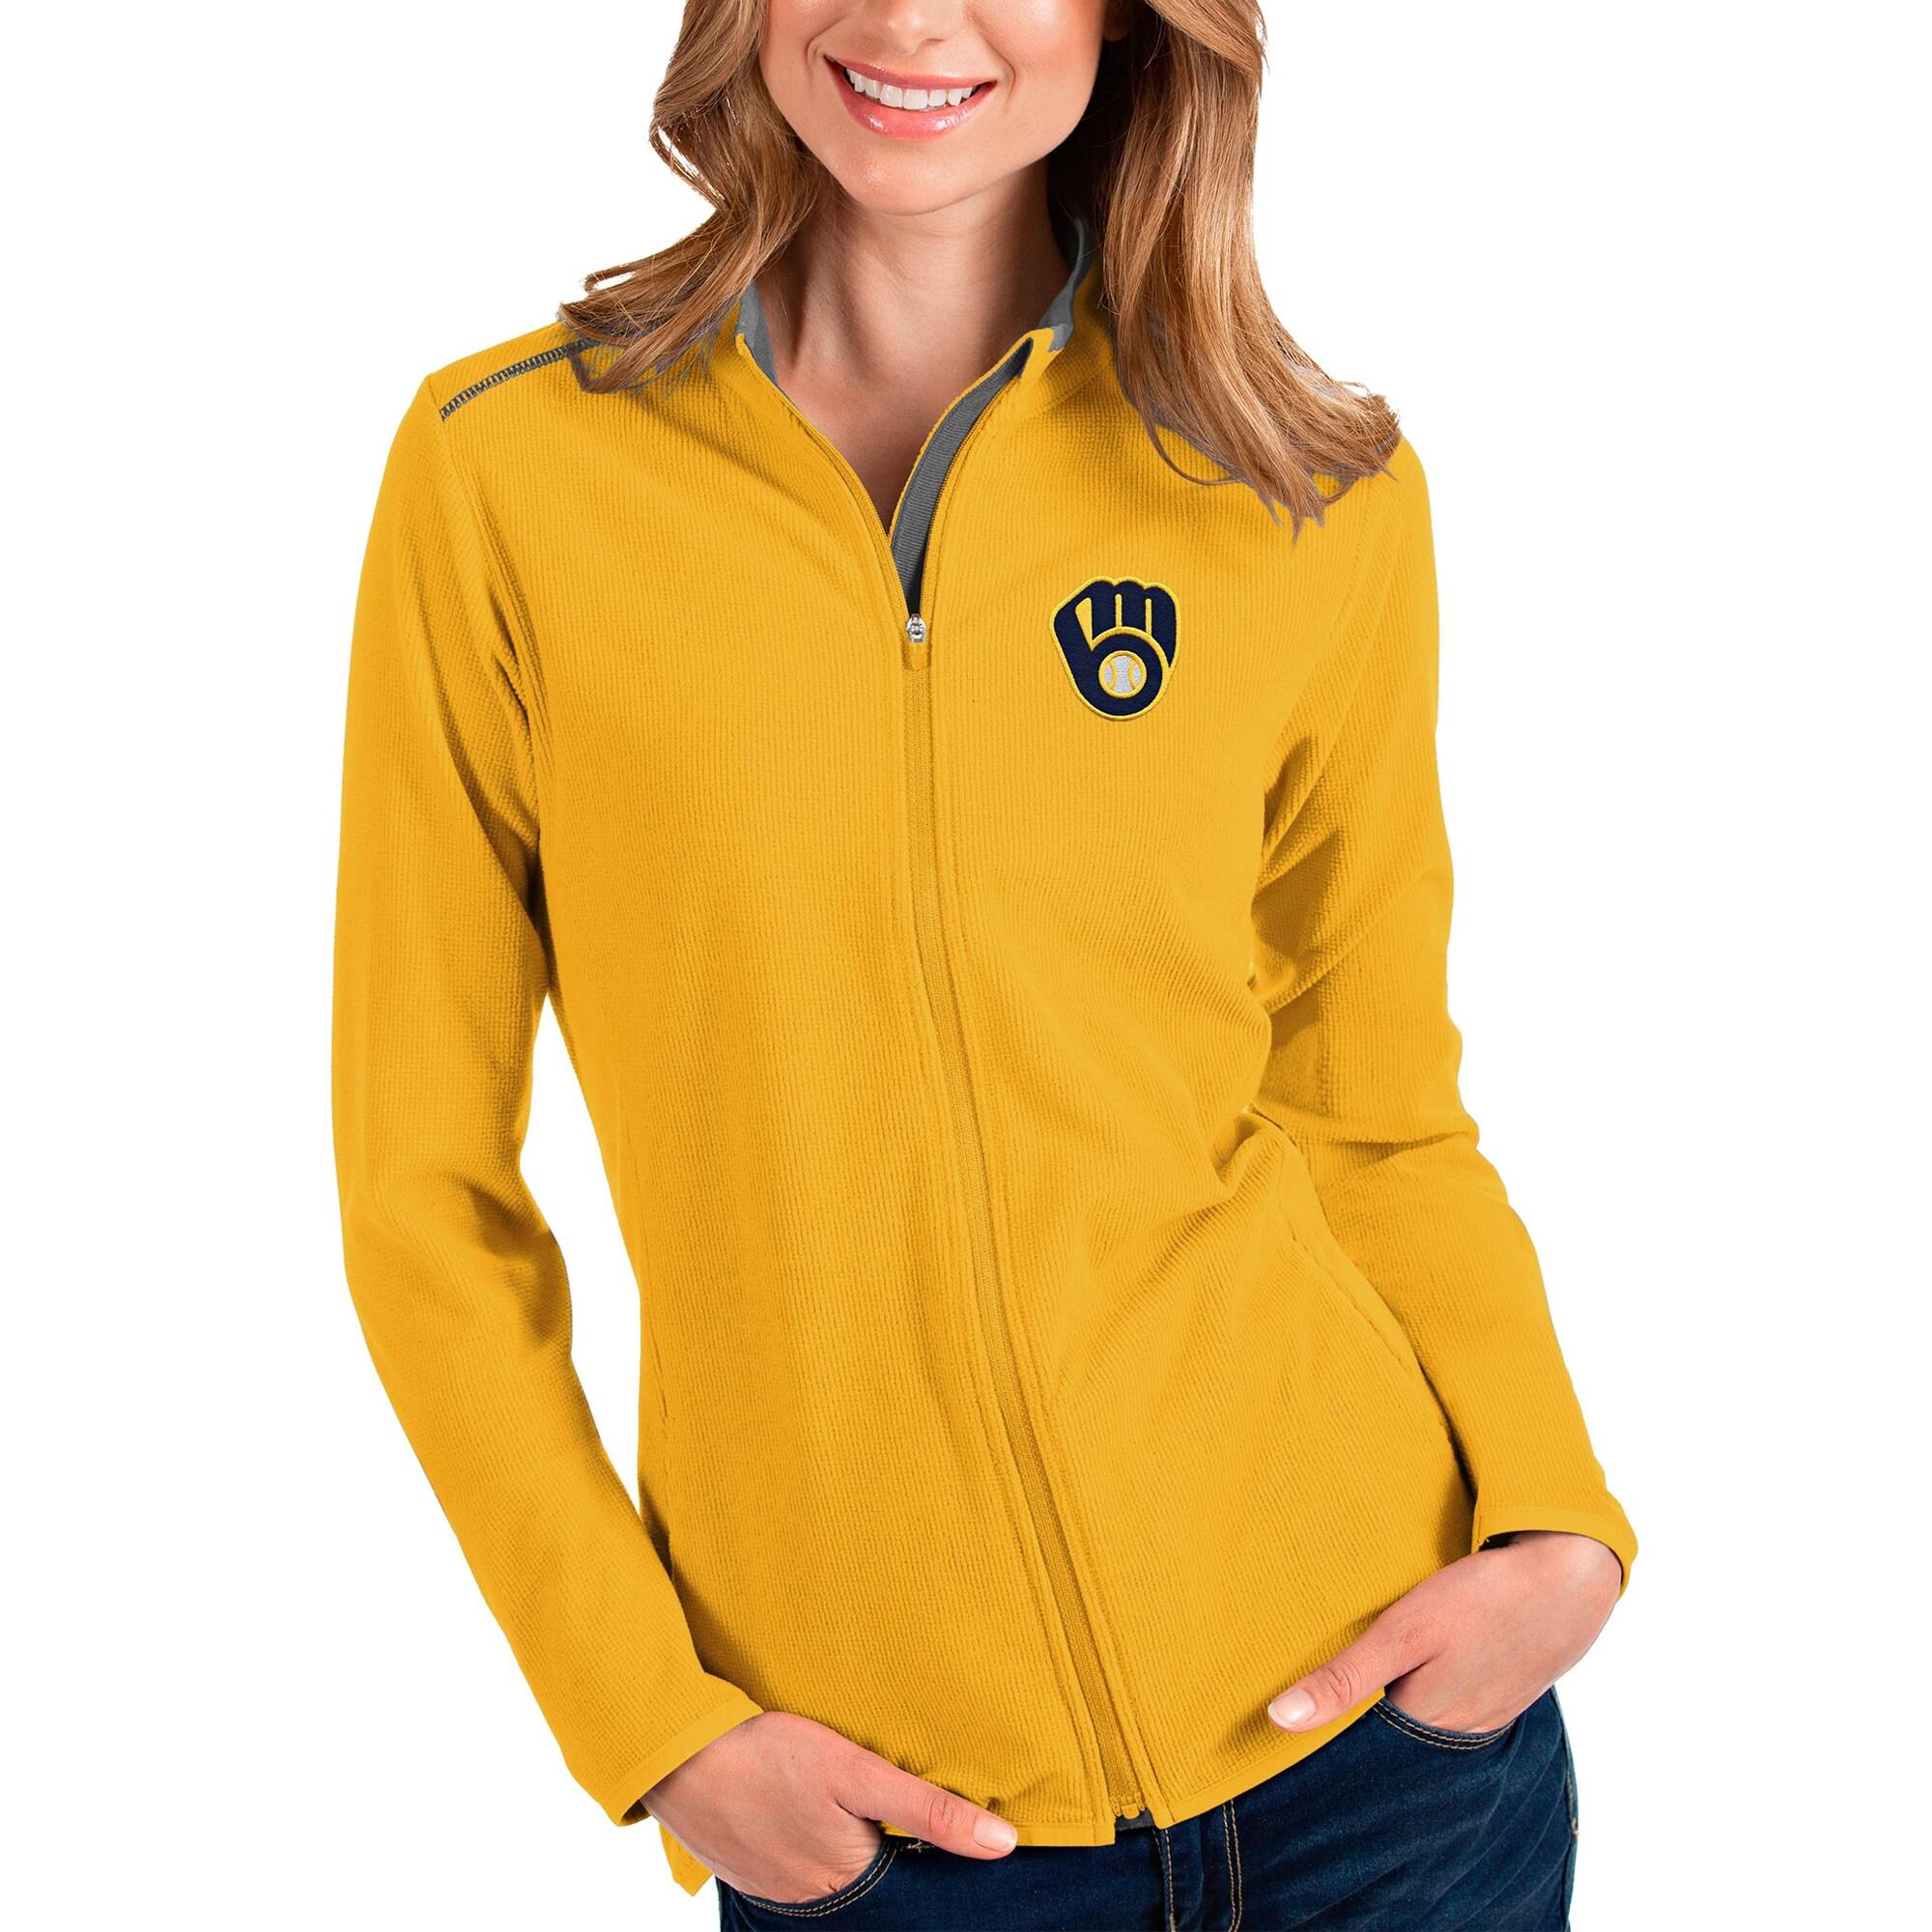 Milwaukee Brewers Antigua Women's Glacier Full-Zip Jacket - Gold/Charcoal